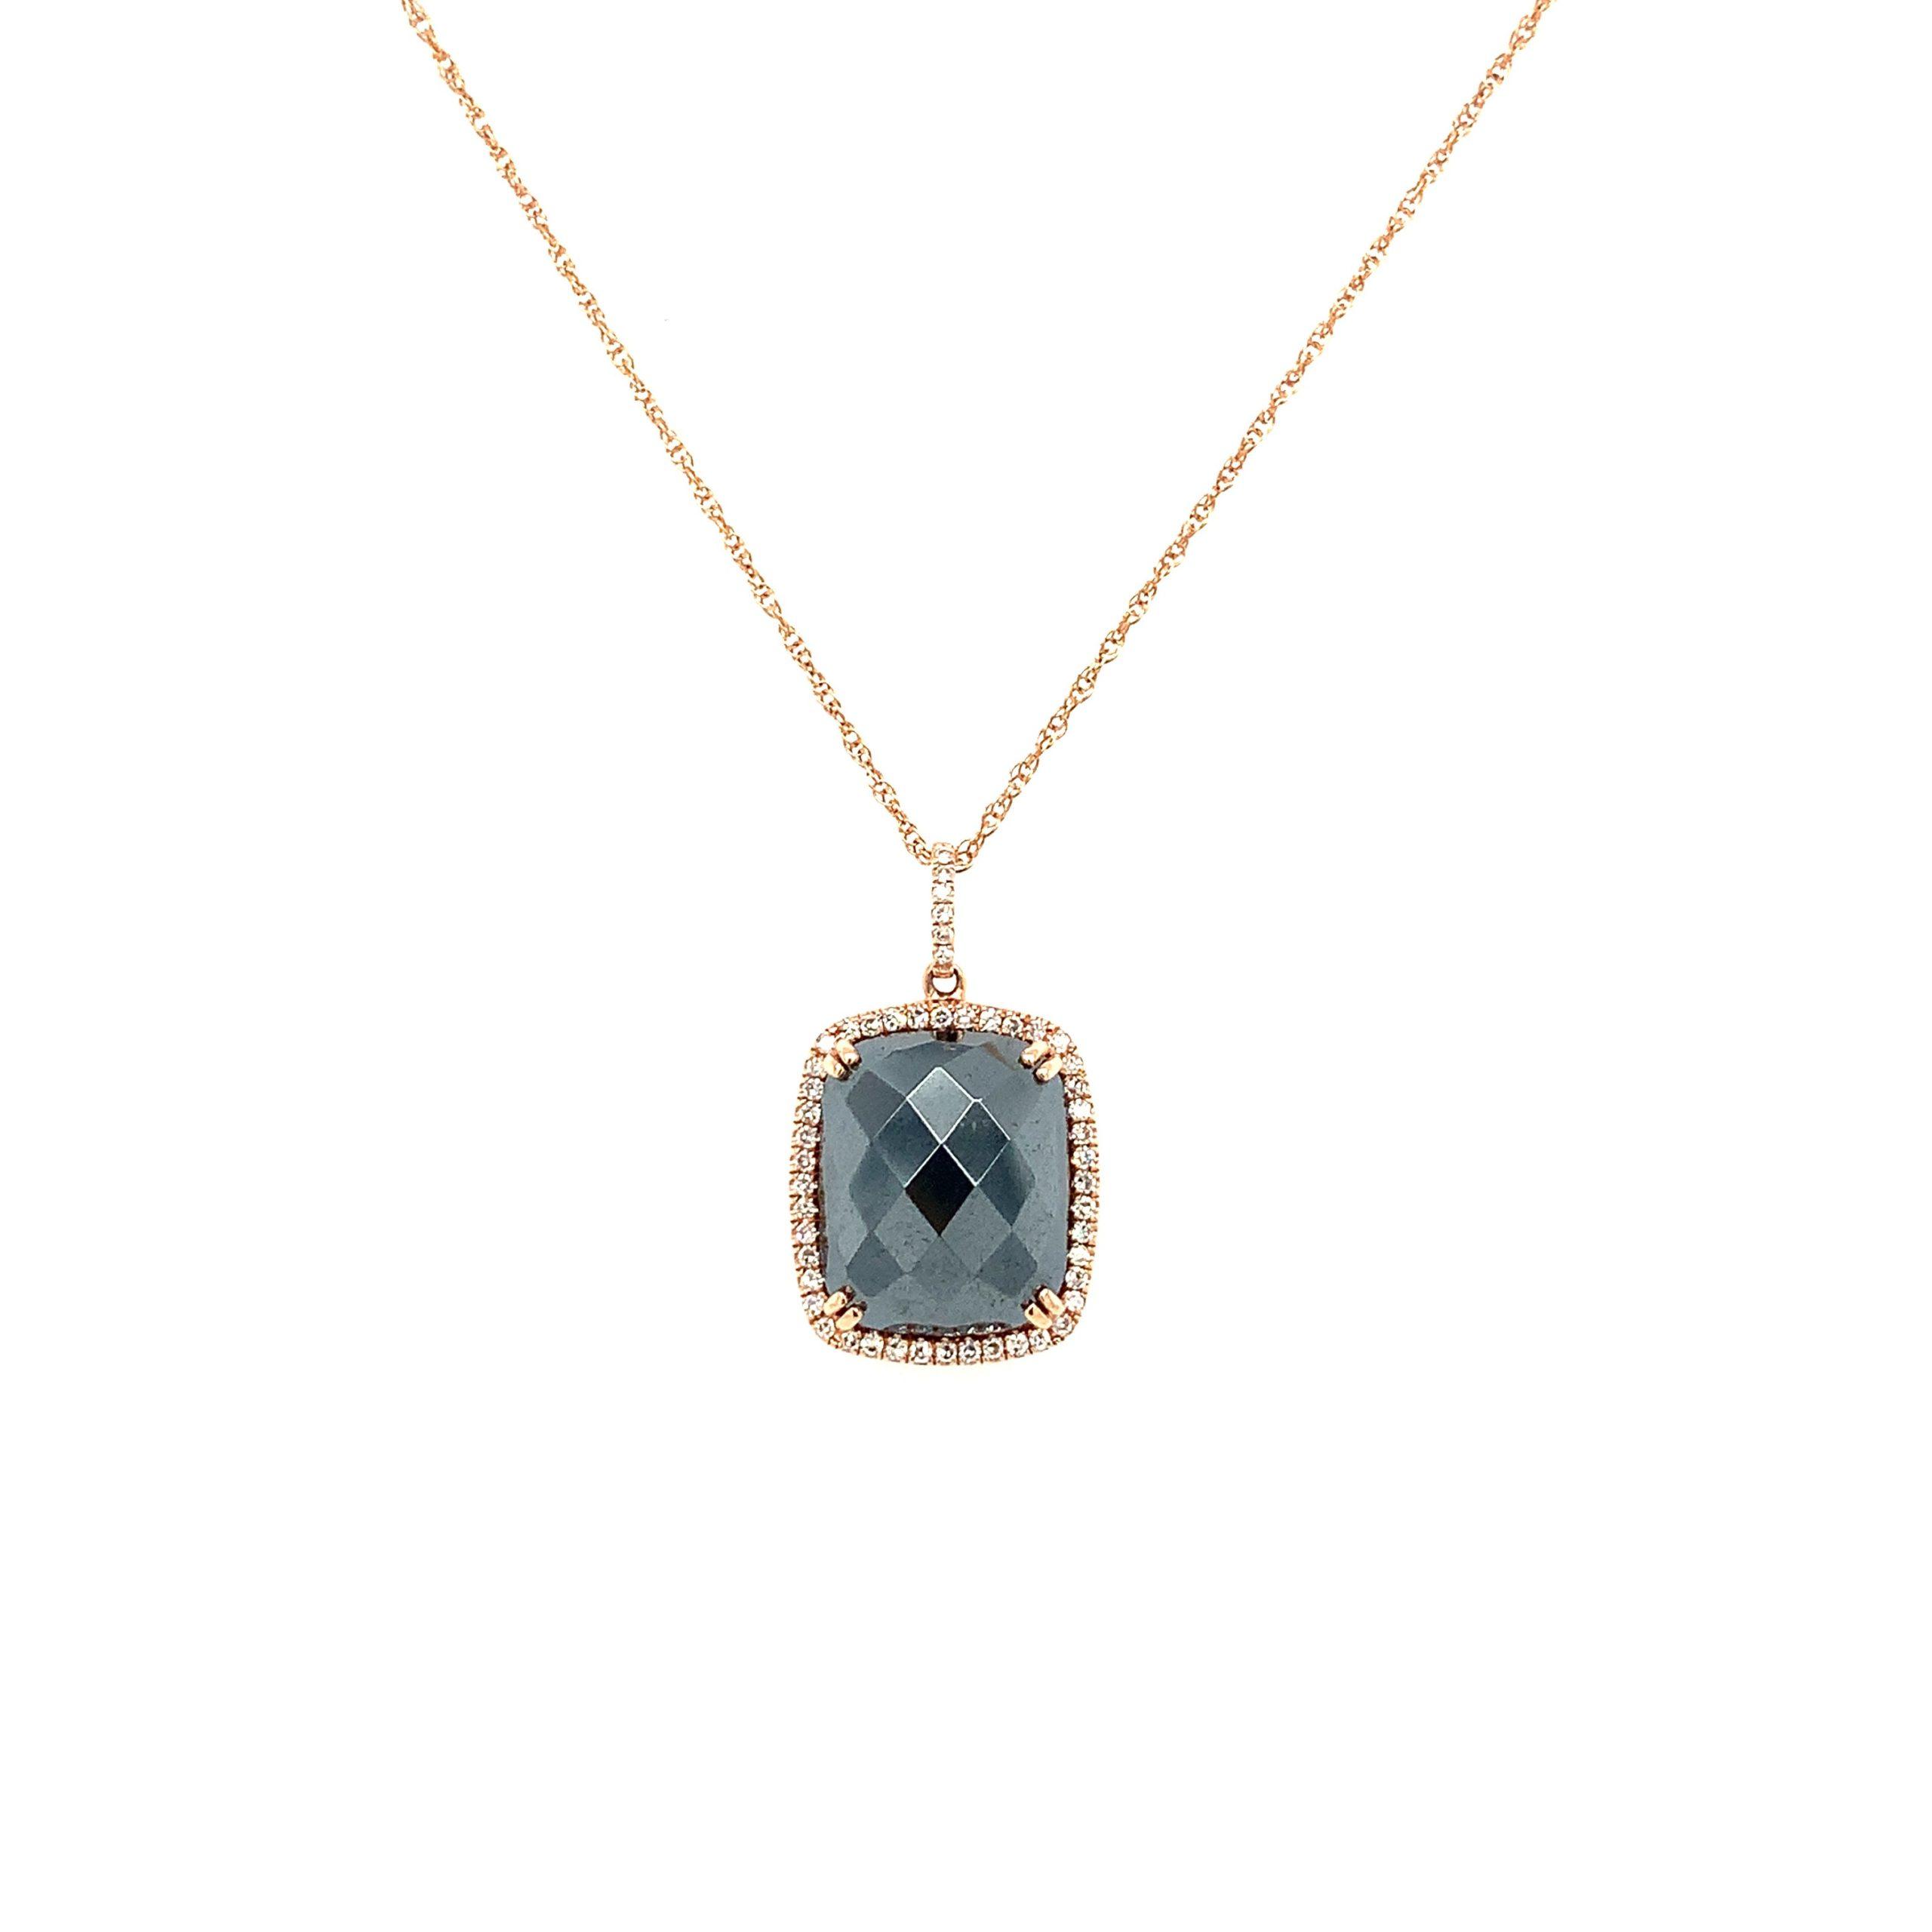 Rose Gold Hematite Pendant Necklace